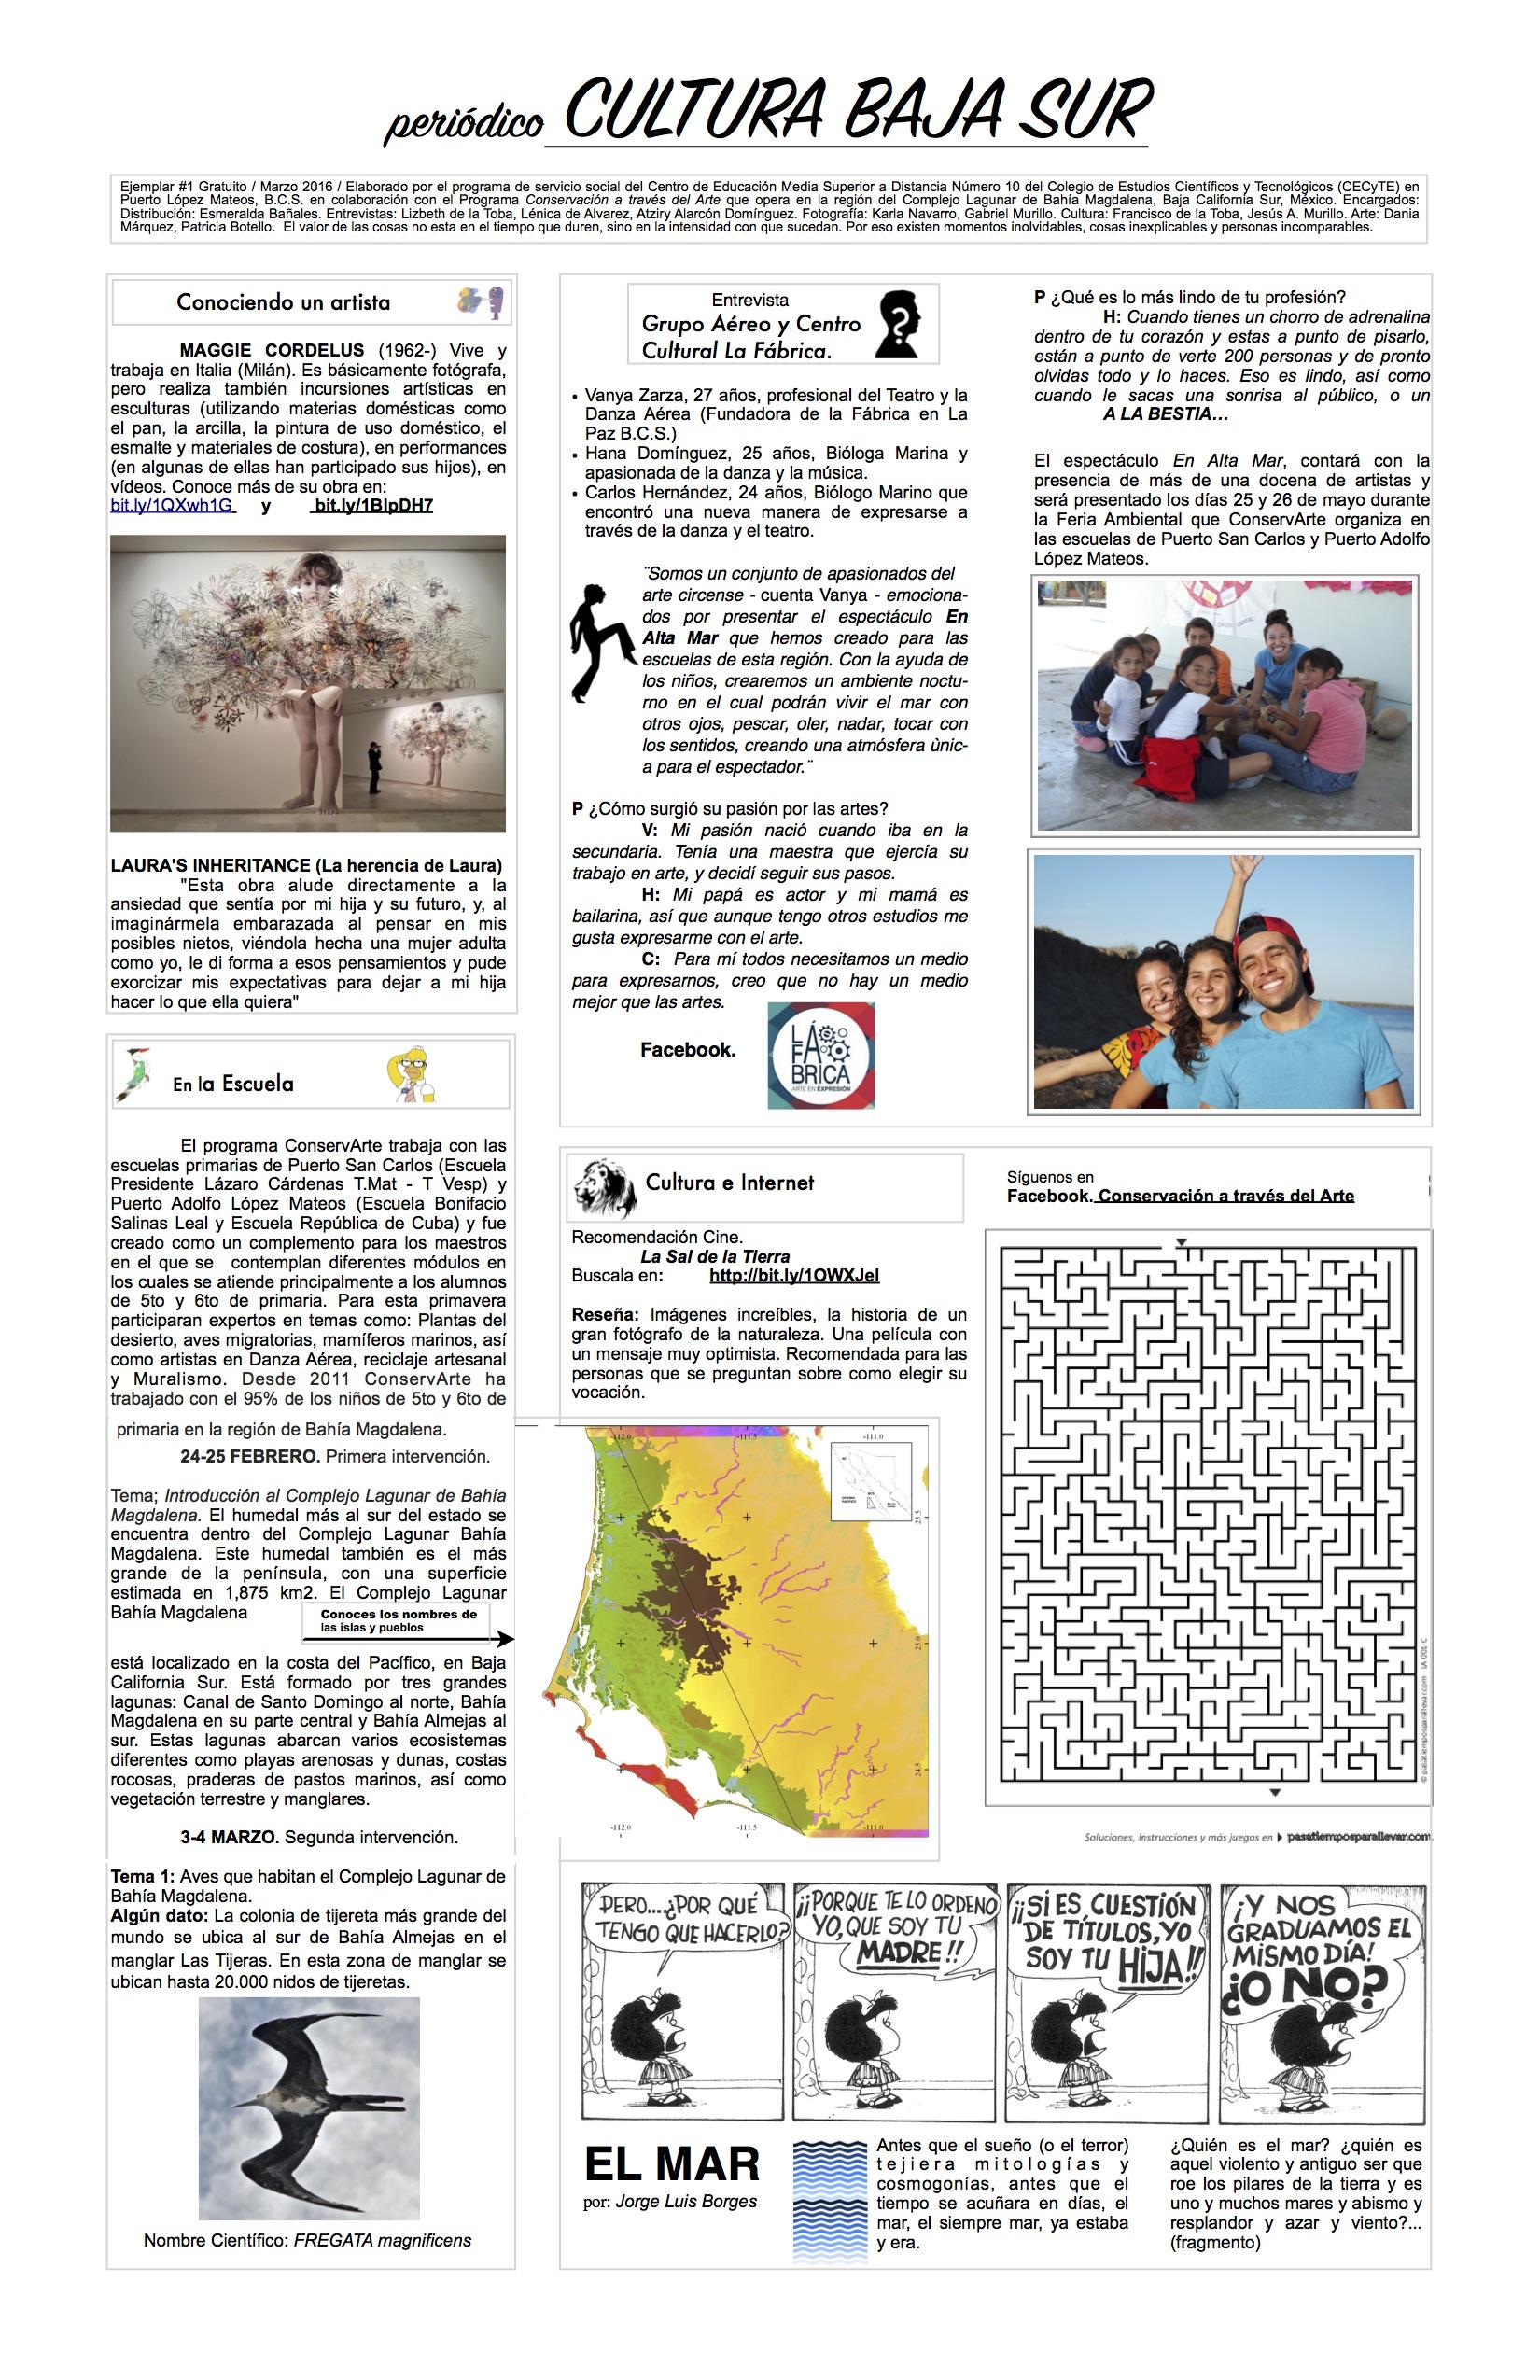 periodico-cultura-baja-sur-1